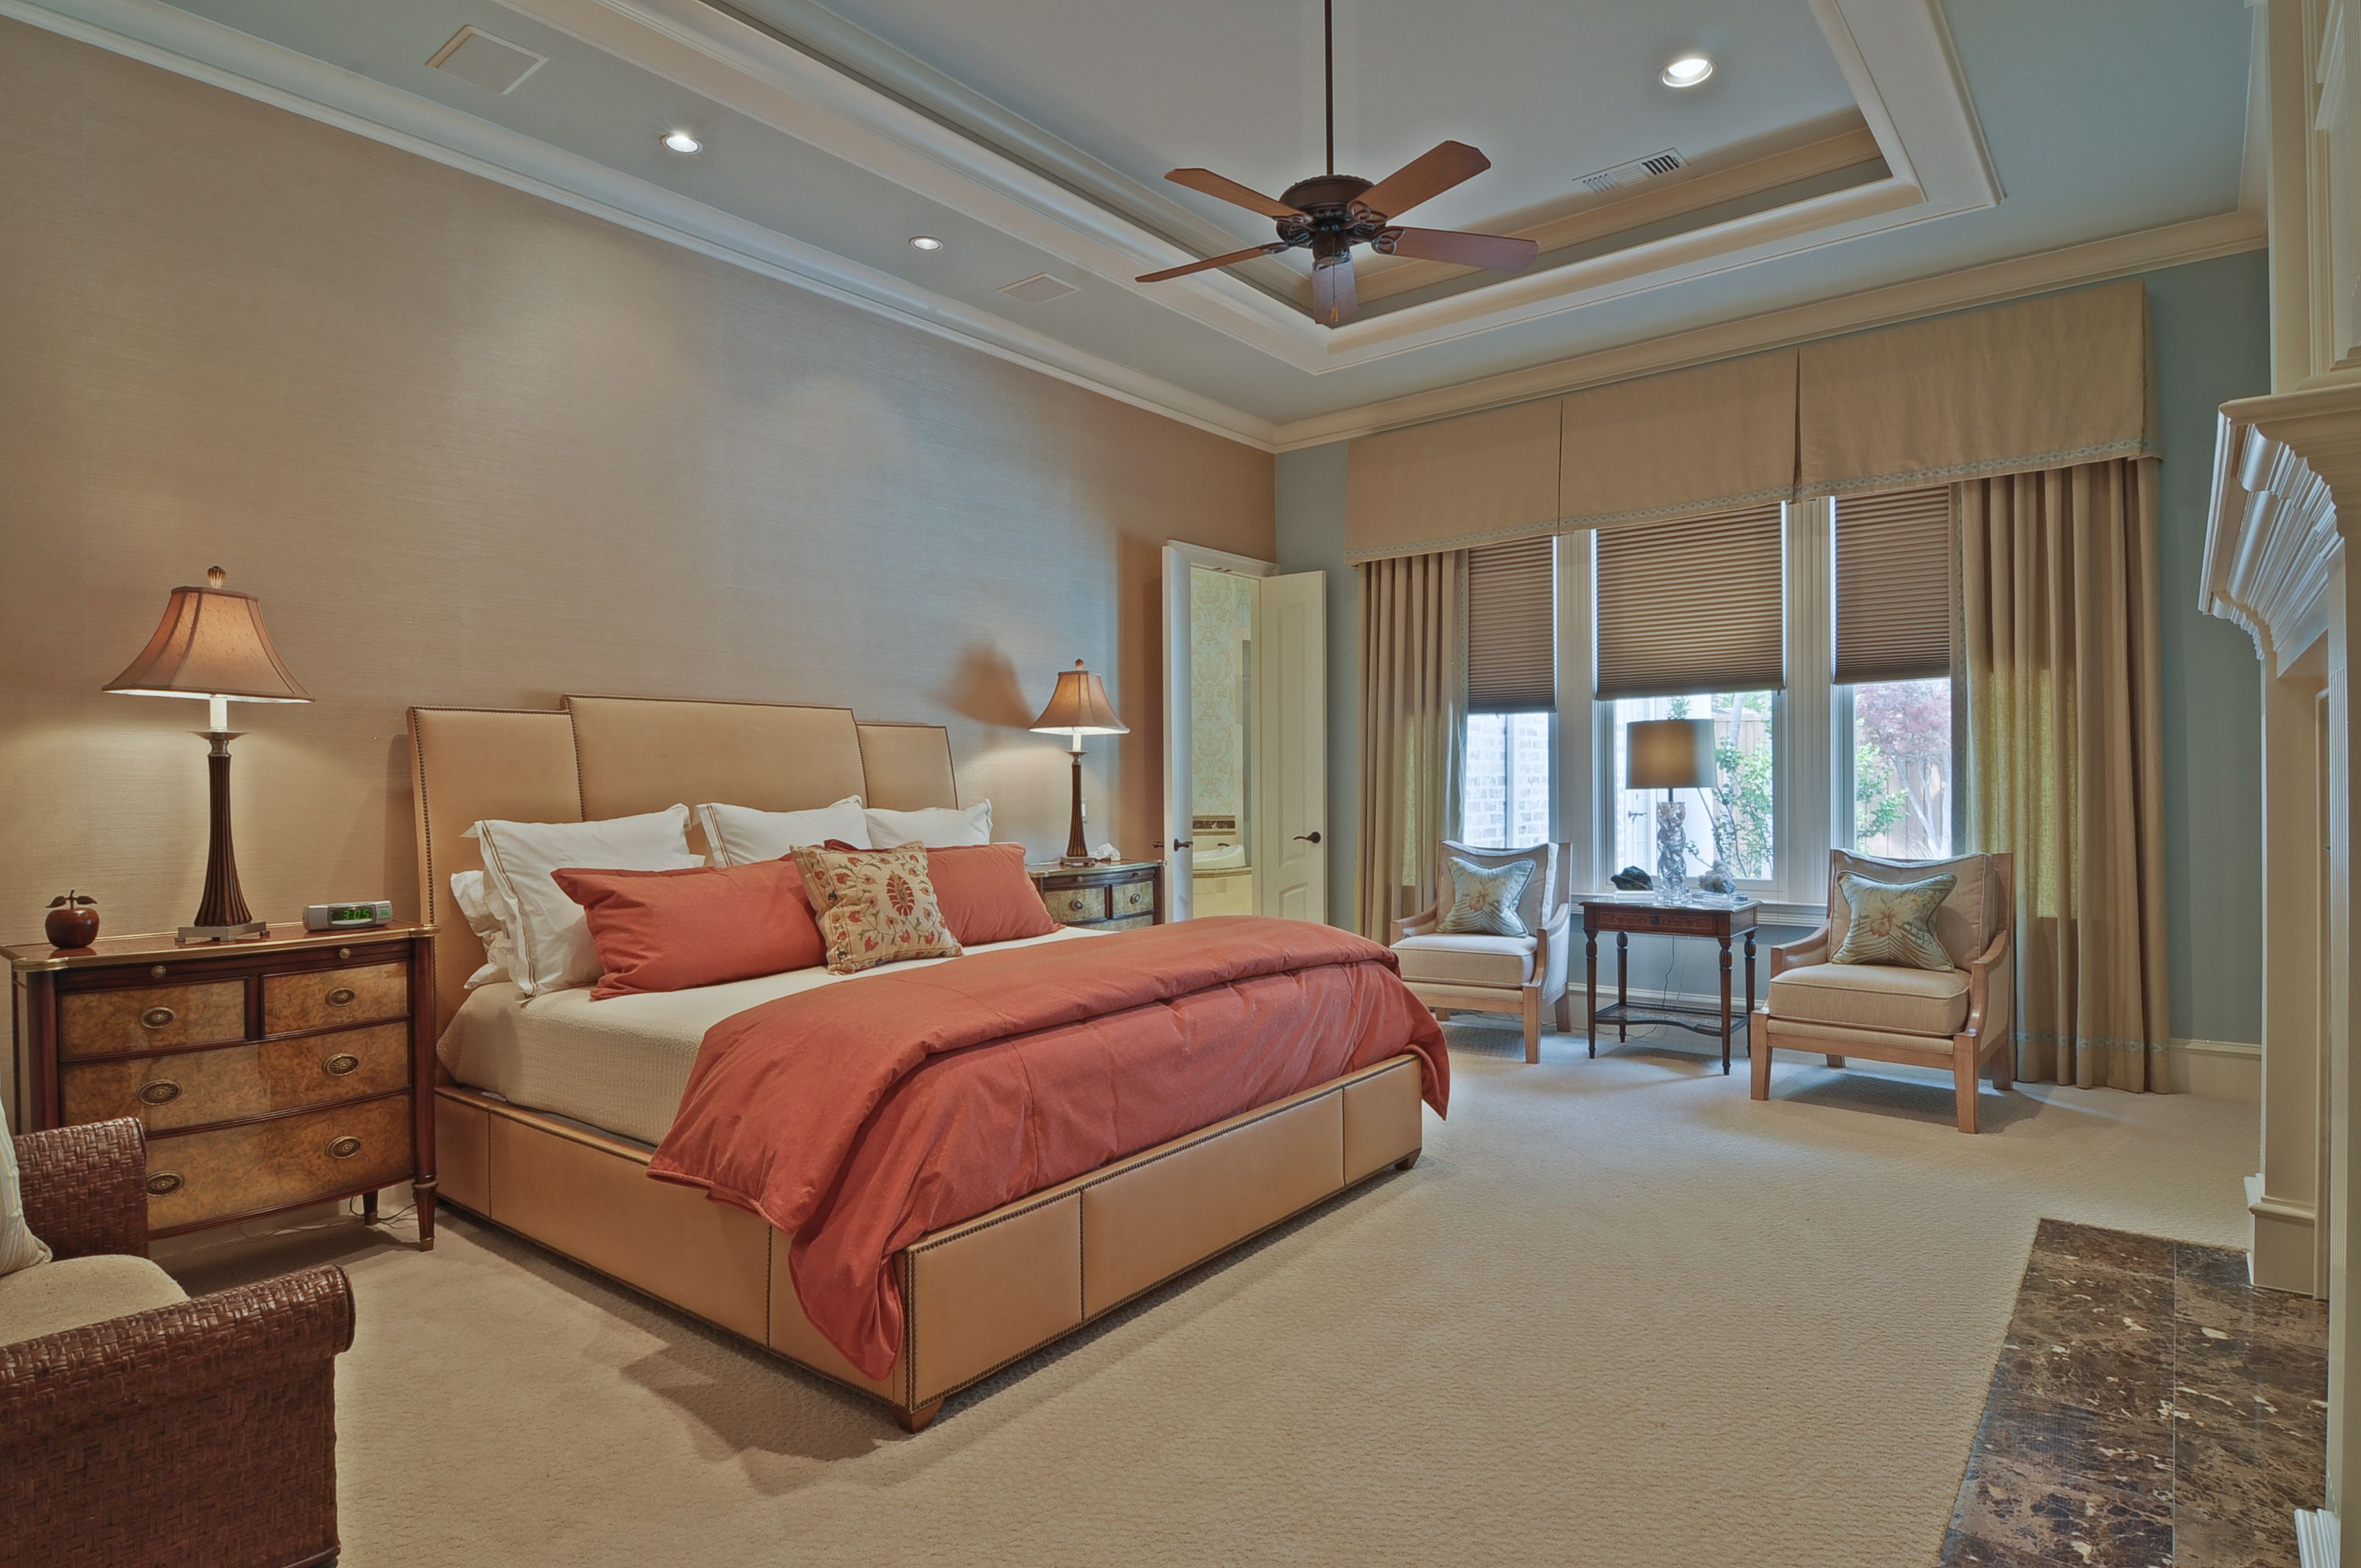 Master bedroom images  Serene Master bedroom  Total  Interiors Inc  Pinterest